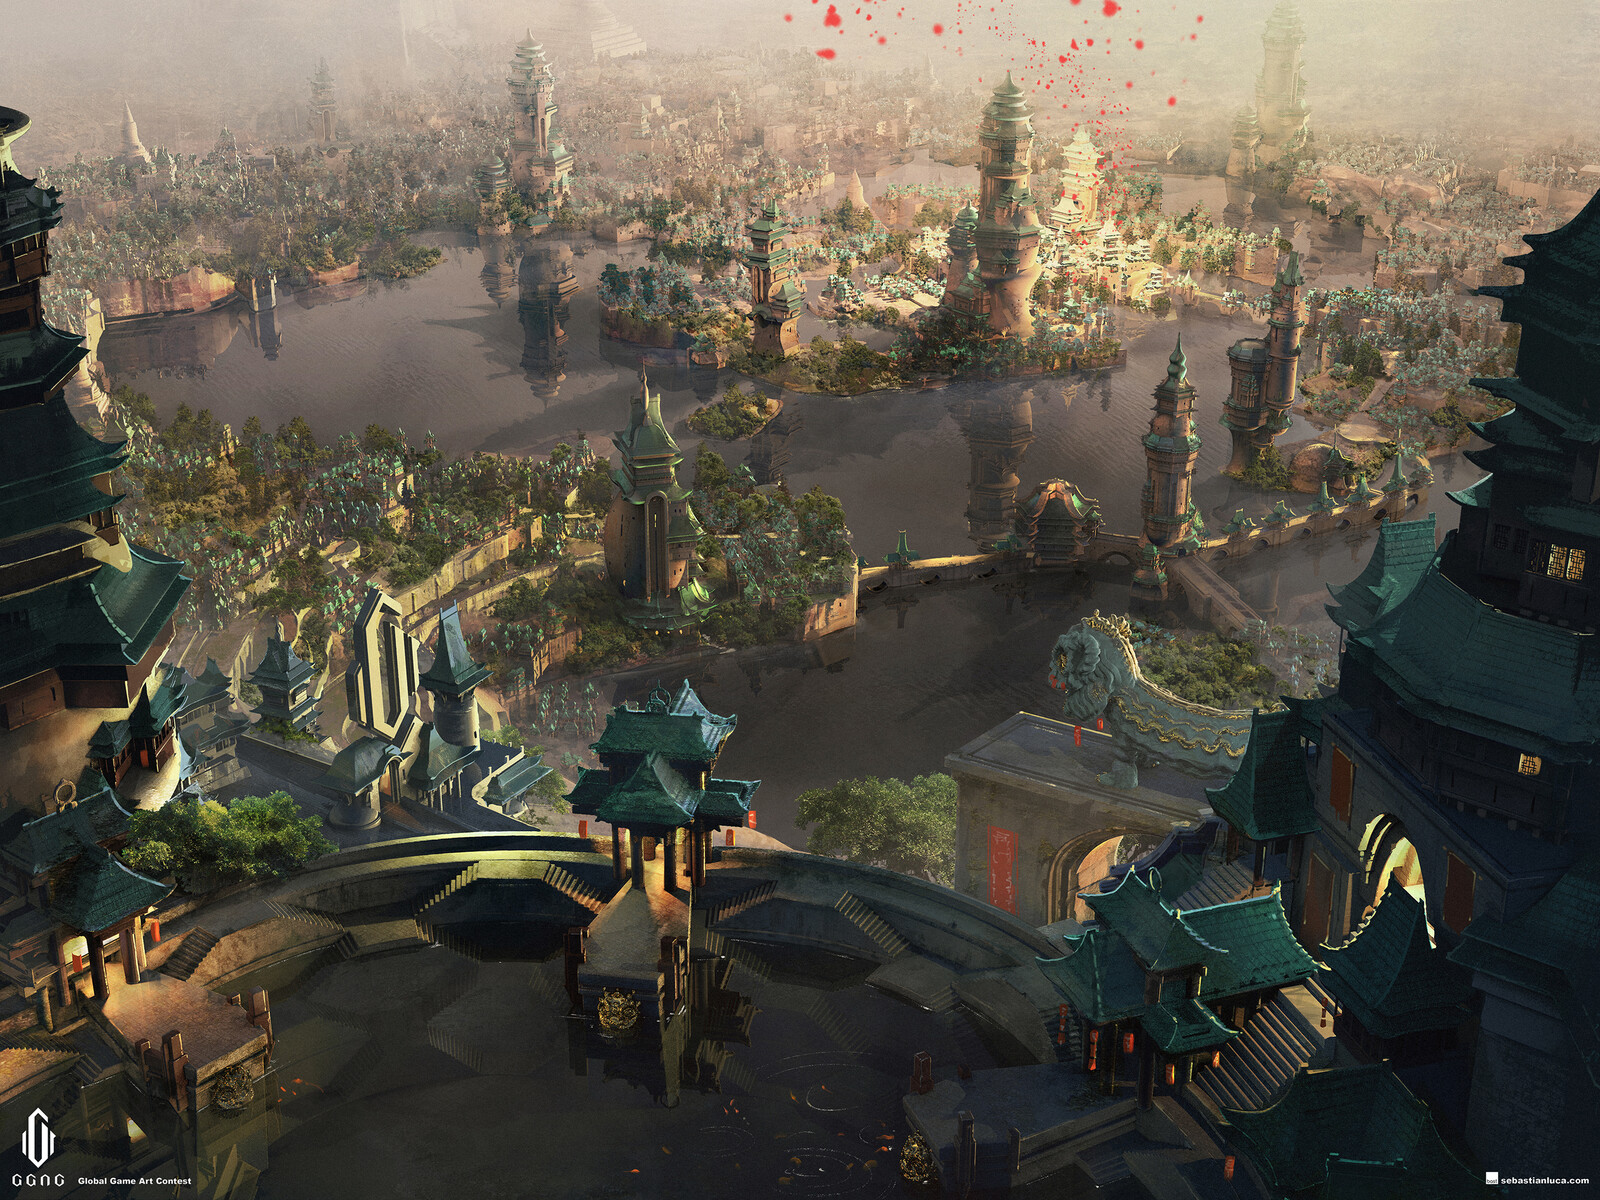 GGAC - Kingdom of Loulan